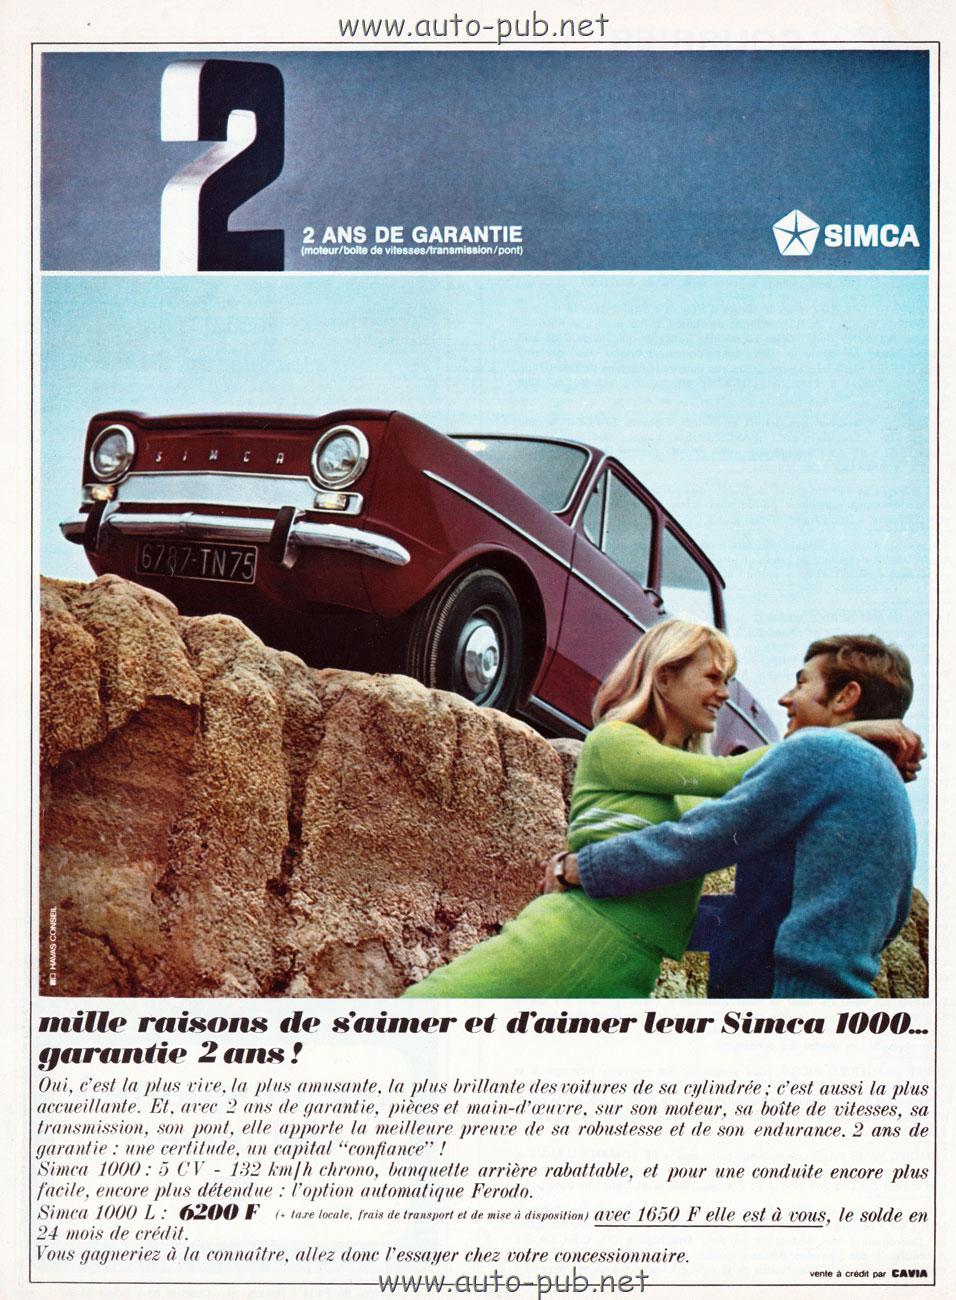 Simca-1000-raison-aimer